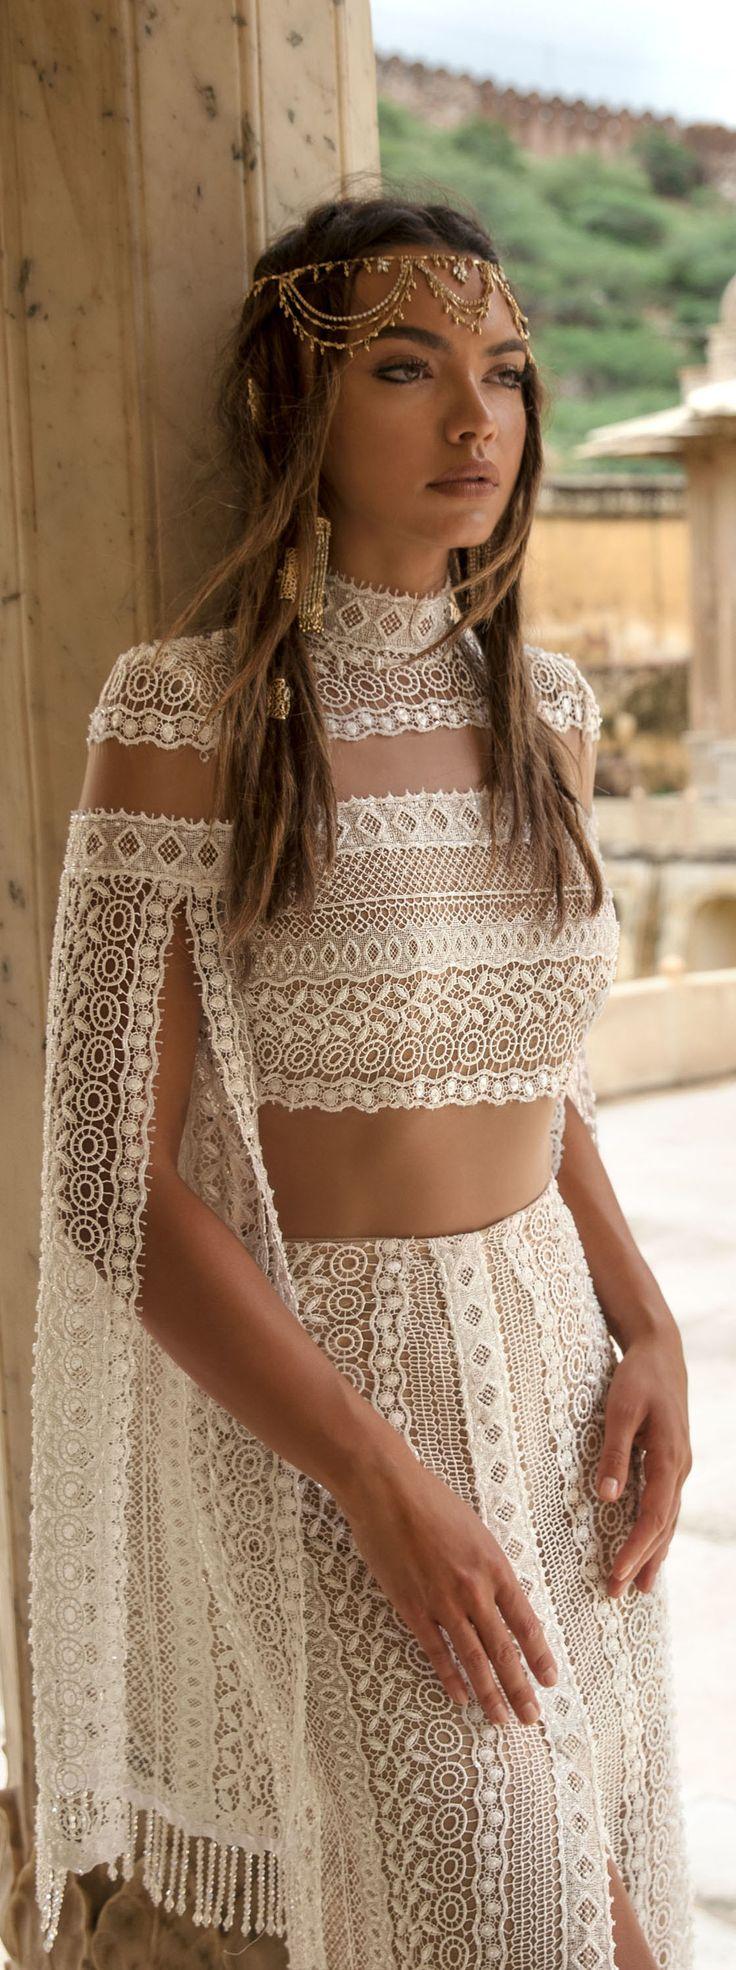 Bohemian wedding dress from Carchy